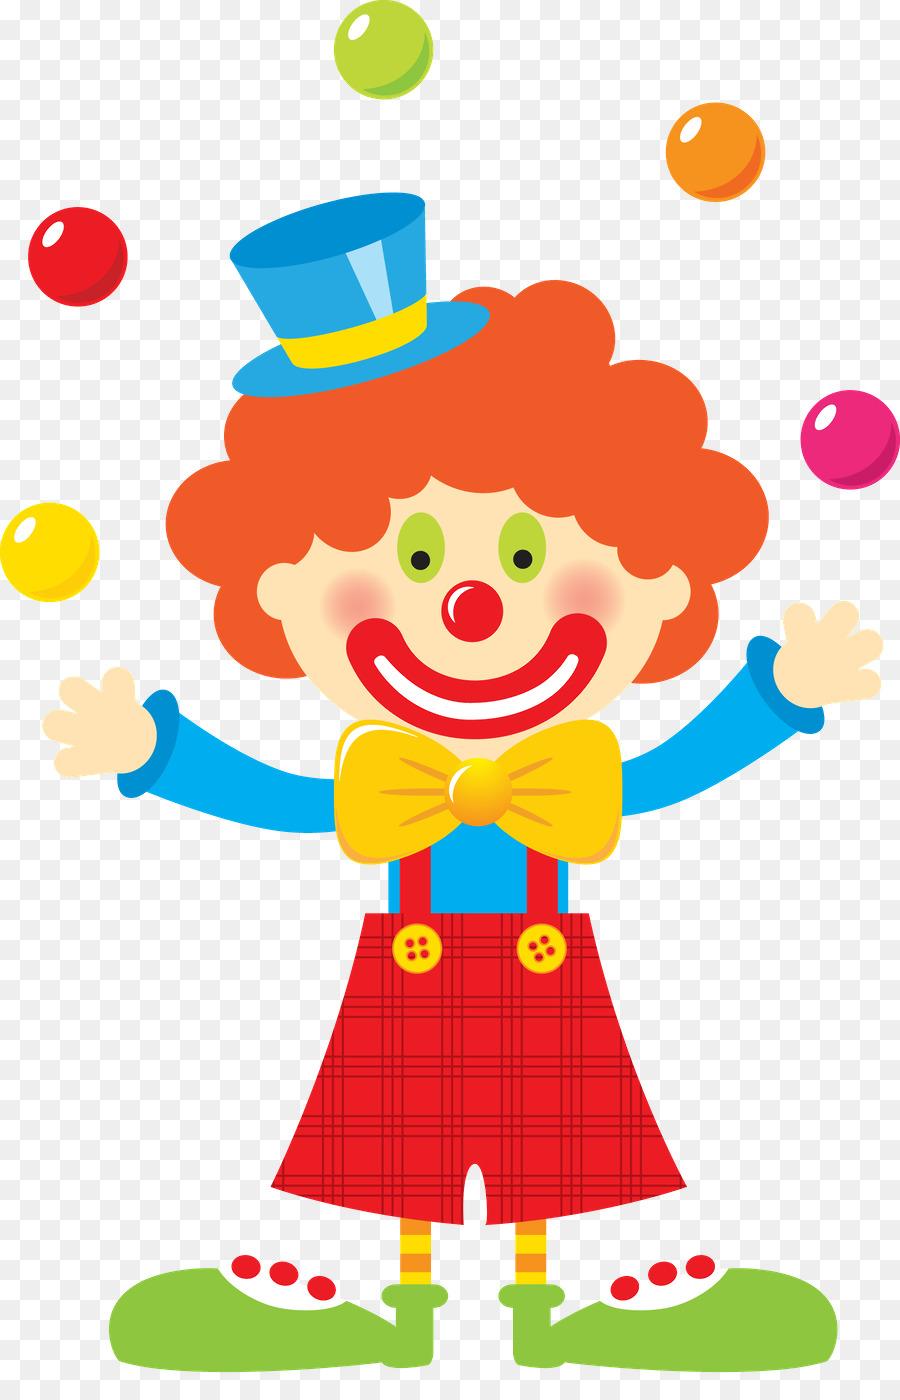 clown car circus drawing clip art clown png download 900 1384 rh kisspng com clipart clown gratuit clipart clown gratuit